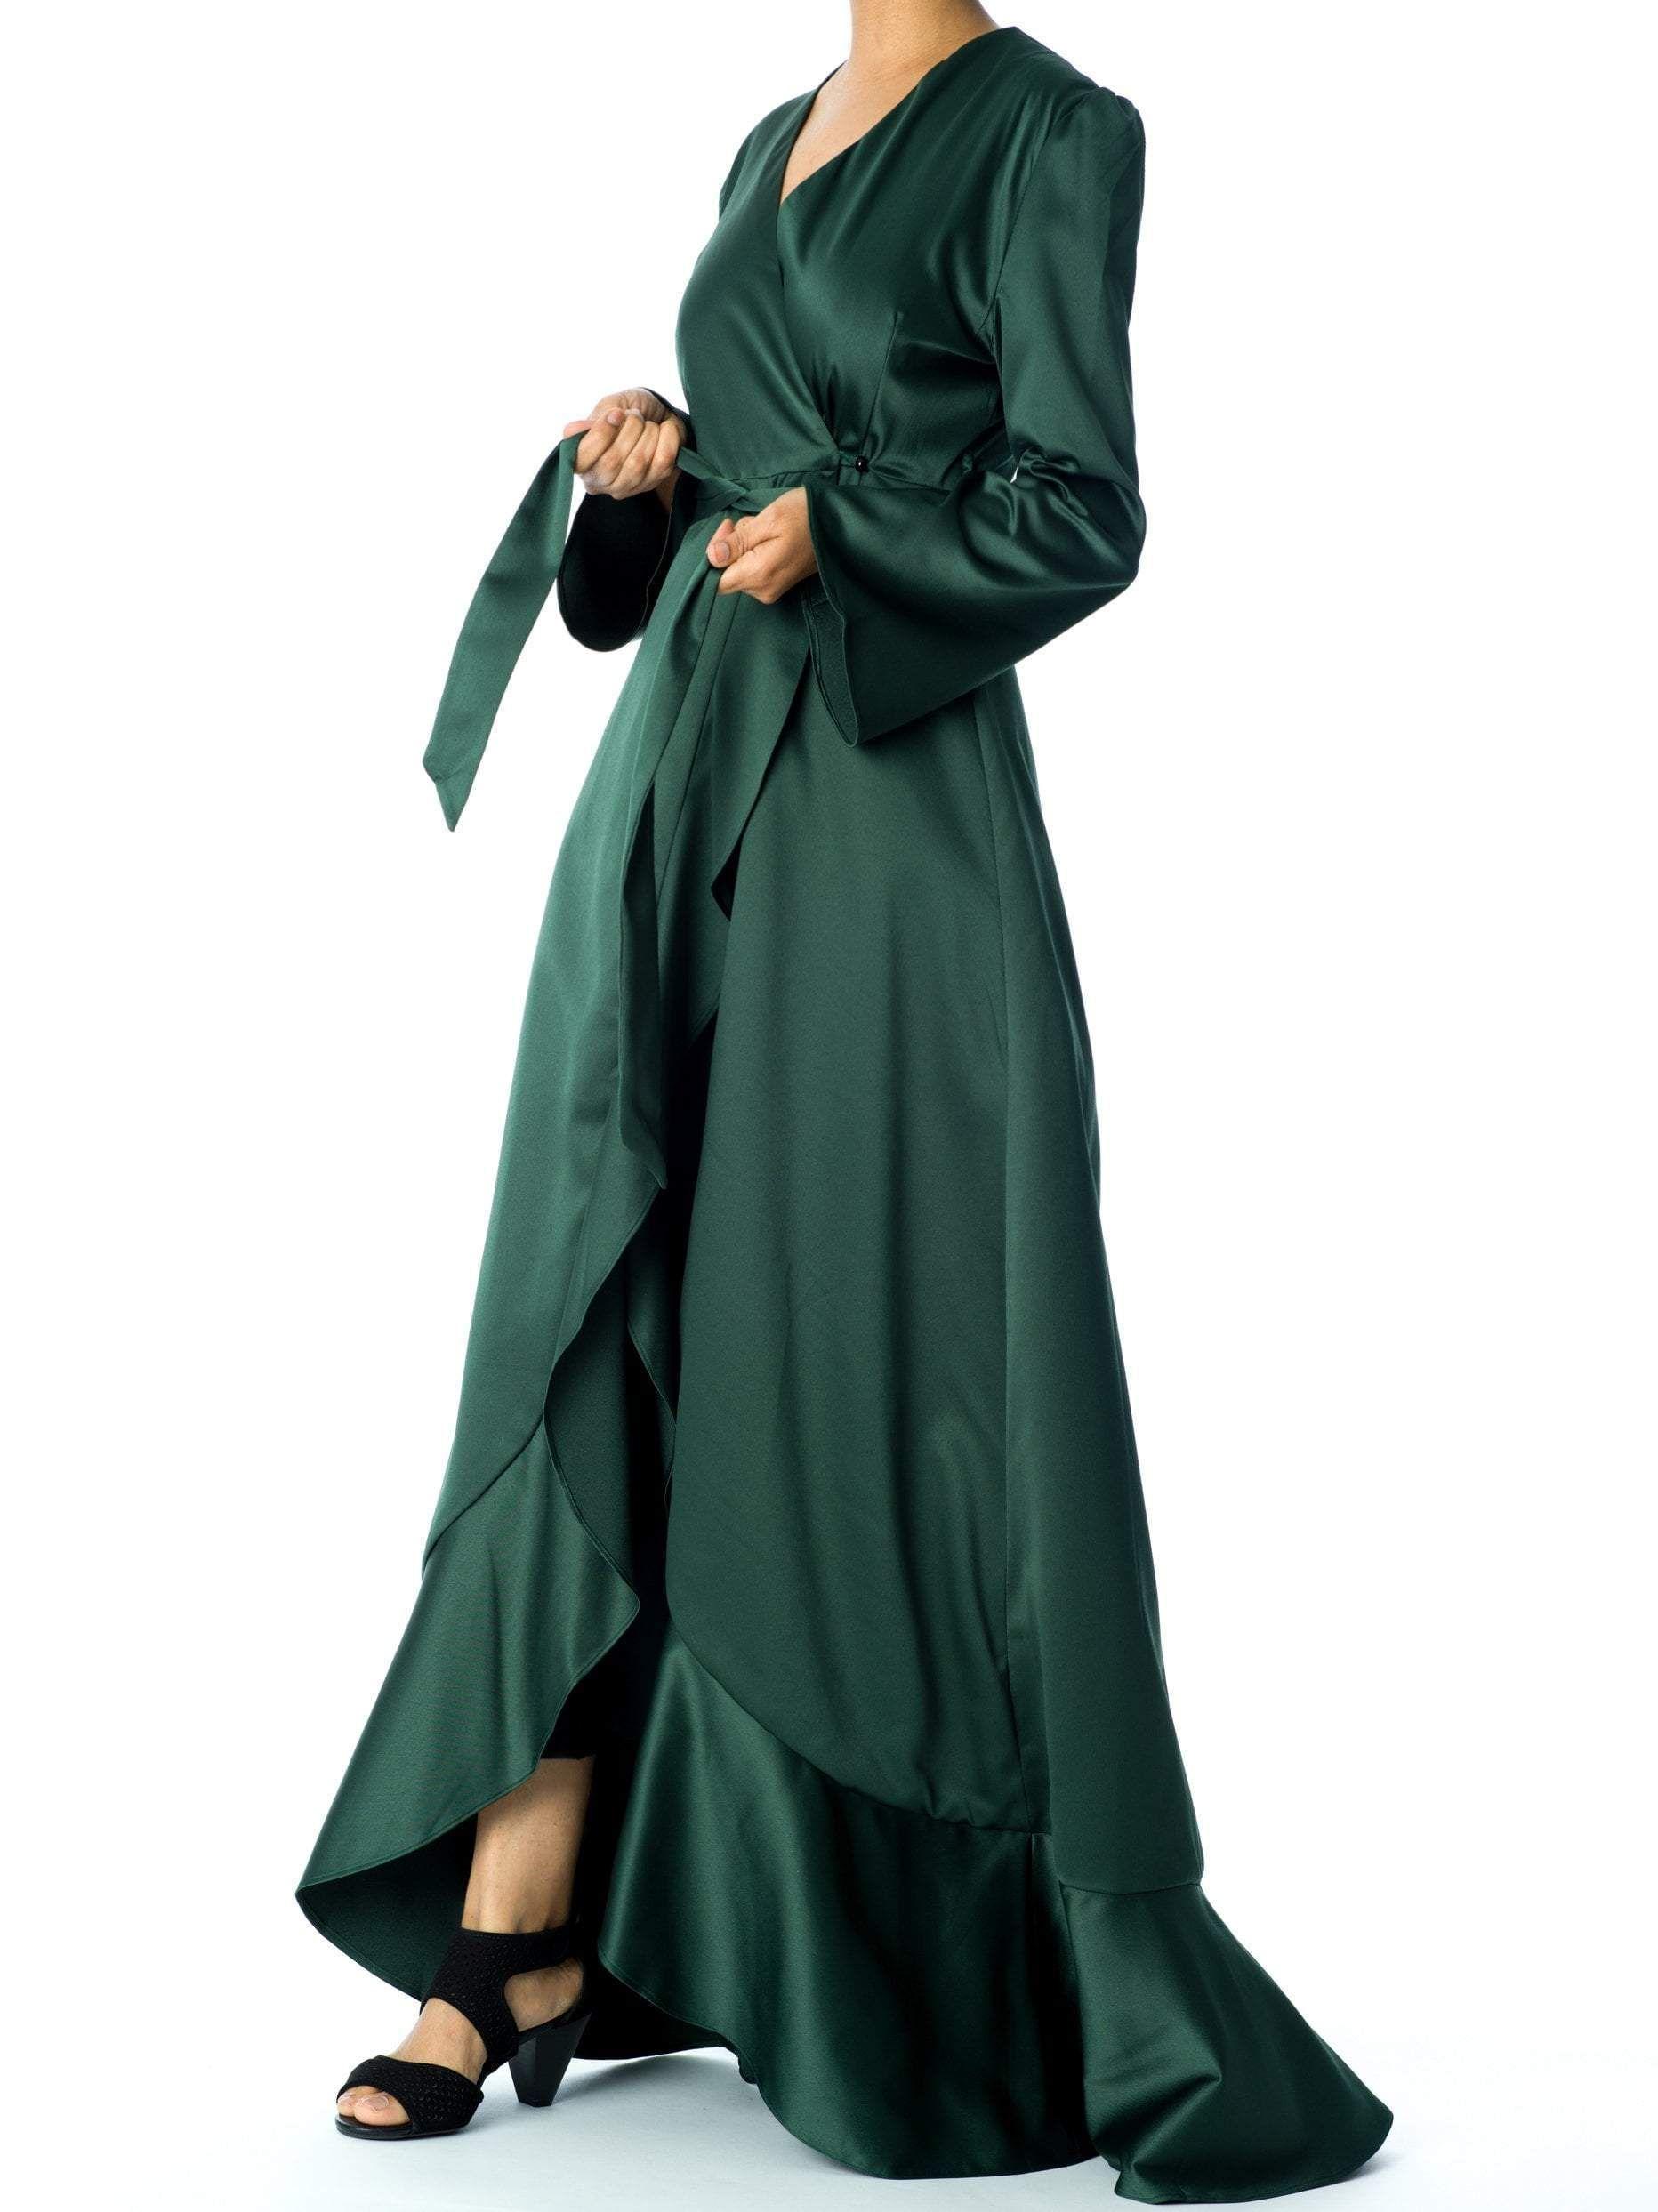 Emerald Green Satin Wrap Kimono Dress Long Sleeve Dress Outfit Kimono Dress Dresses With Leggings [ 2487 x 1864 Pixel ]